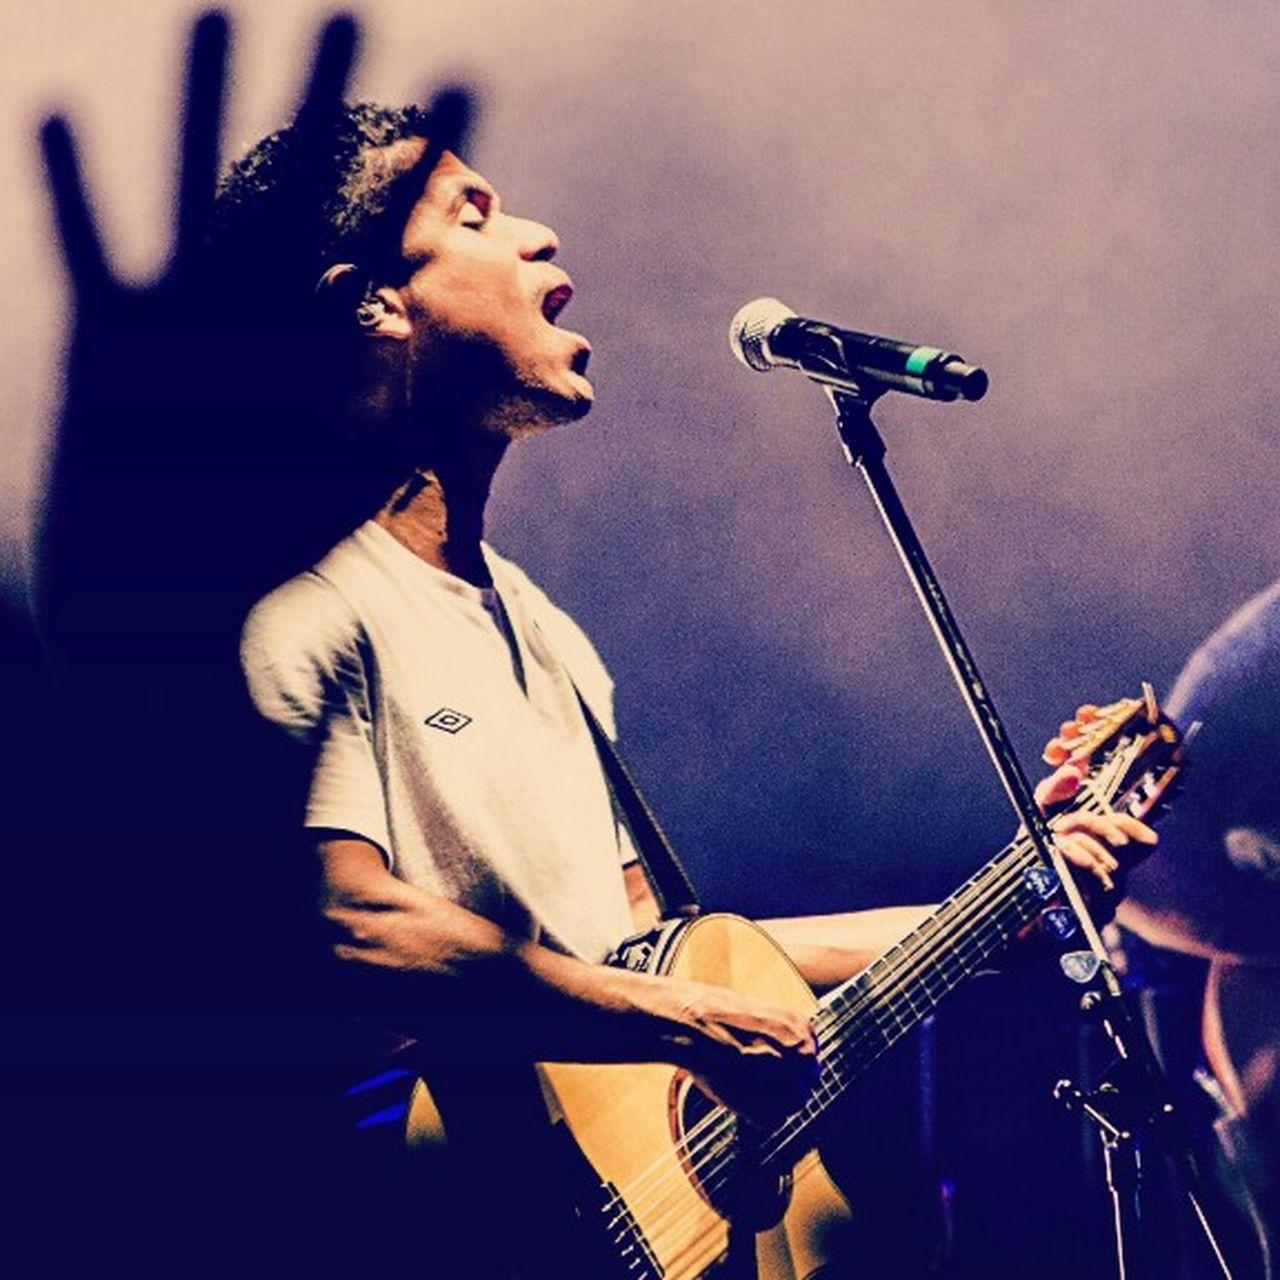 Natiruts - reggae music from Brazil Reggae Natiruts Music Stage